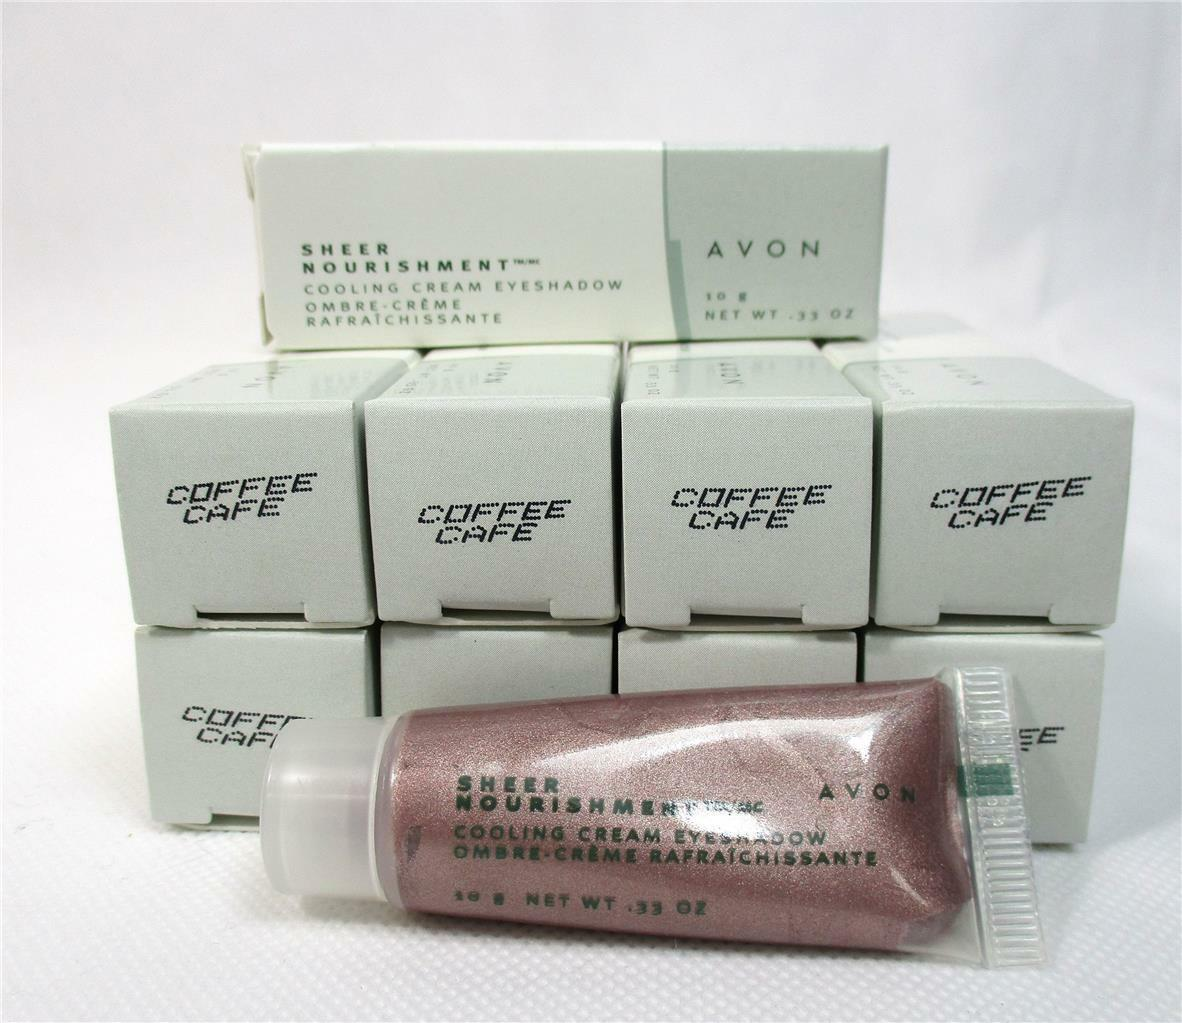 Lot Of 10 Avon Sheer Nourishment Coffee Cafe Cooling Cream Eye Shadow Makeup